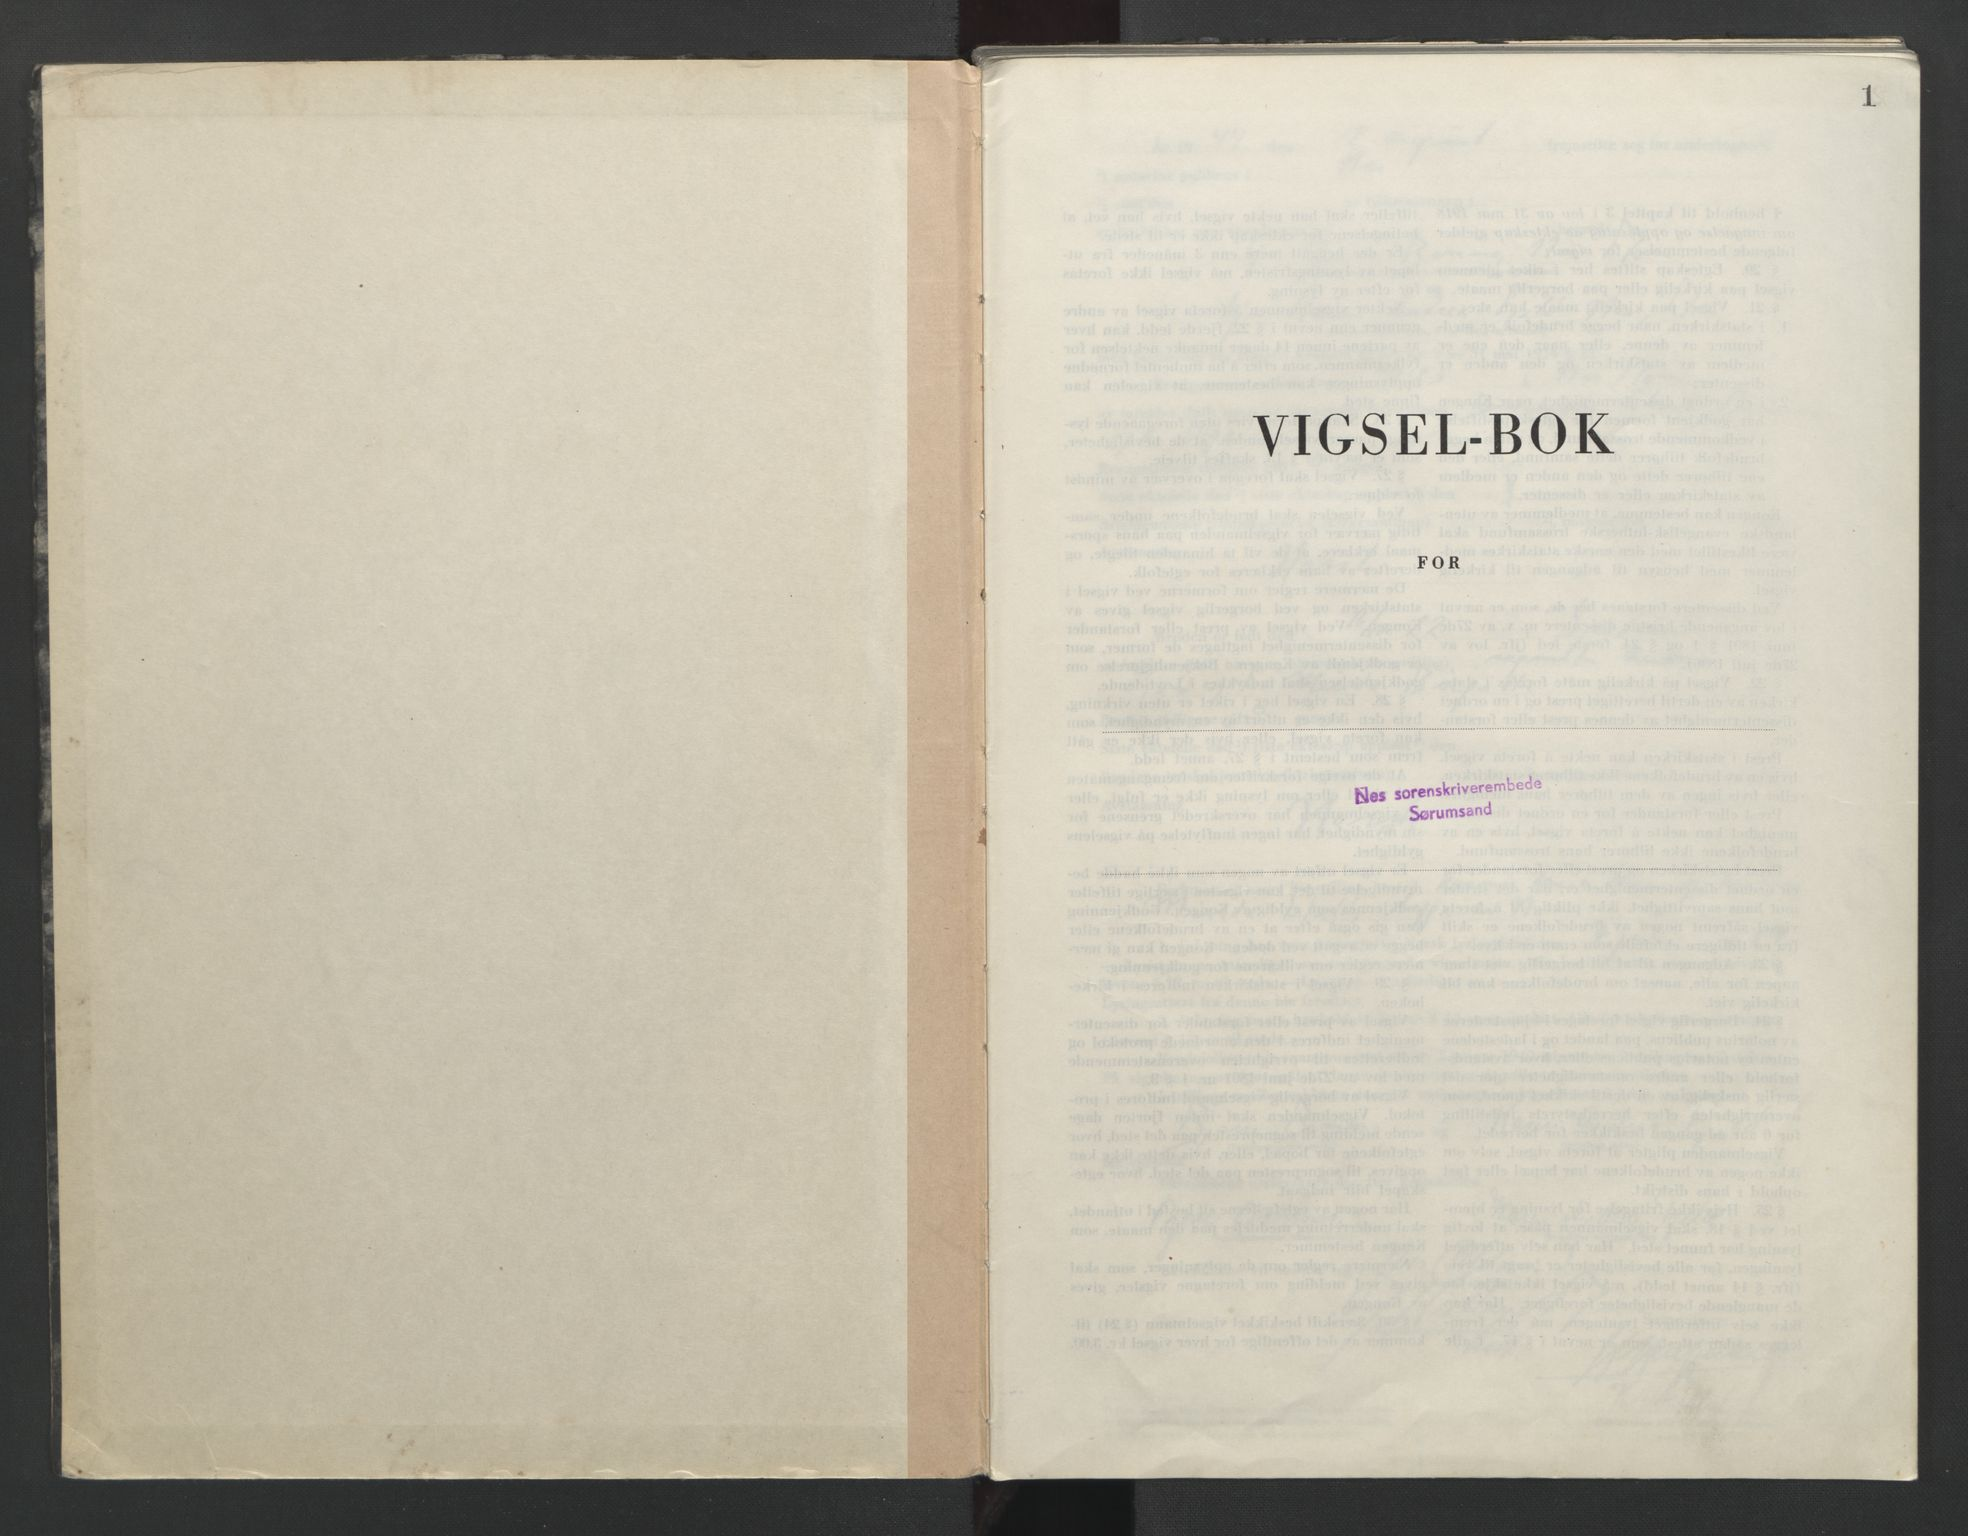 SAO, Nes tingrett, L/Lc/Lca/L0003: Vigselbok, 1944-1953, s. 1